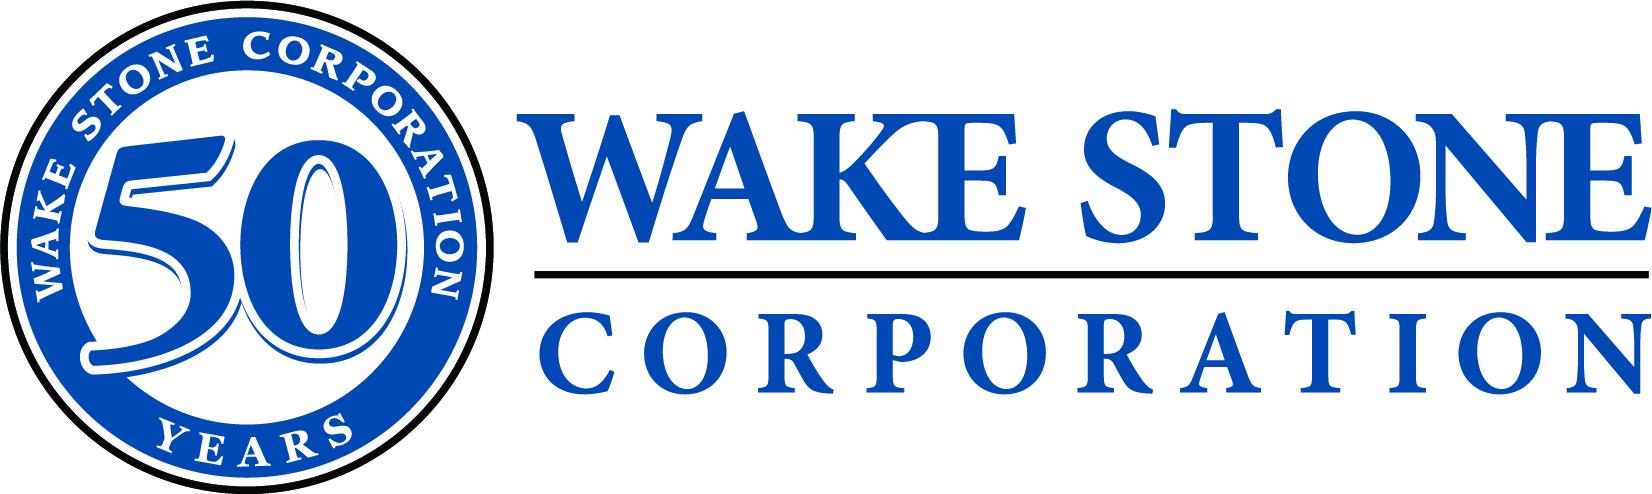 WAKE-003 50 Yr Icon and Logo